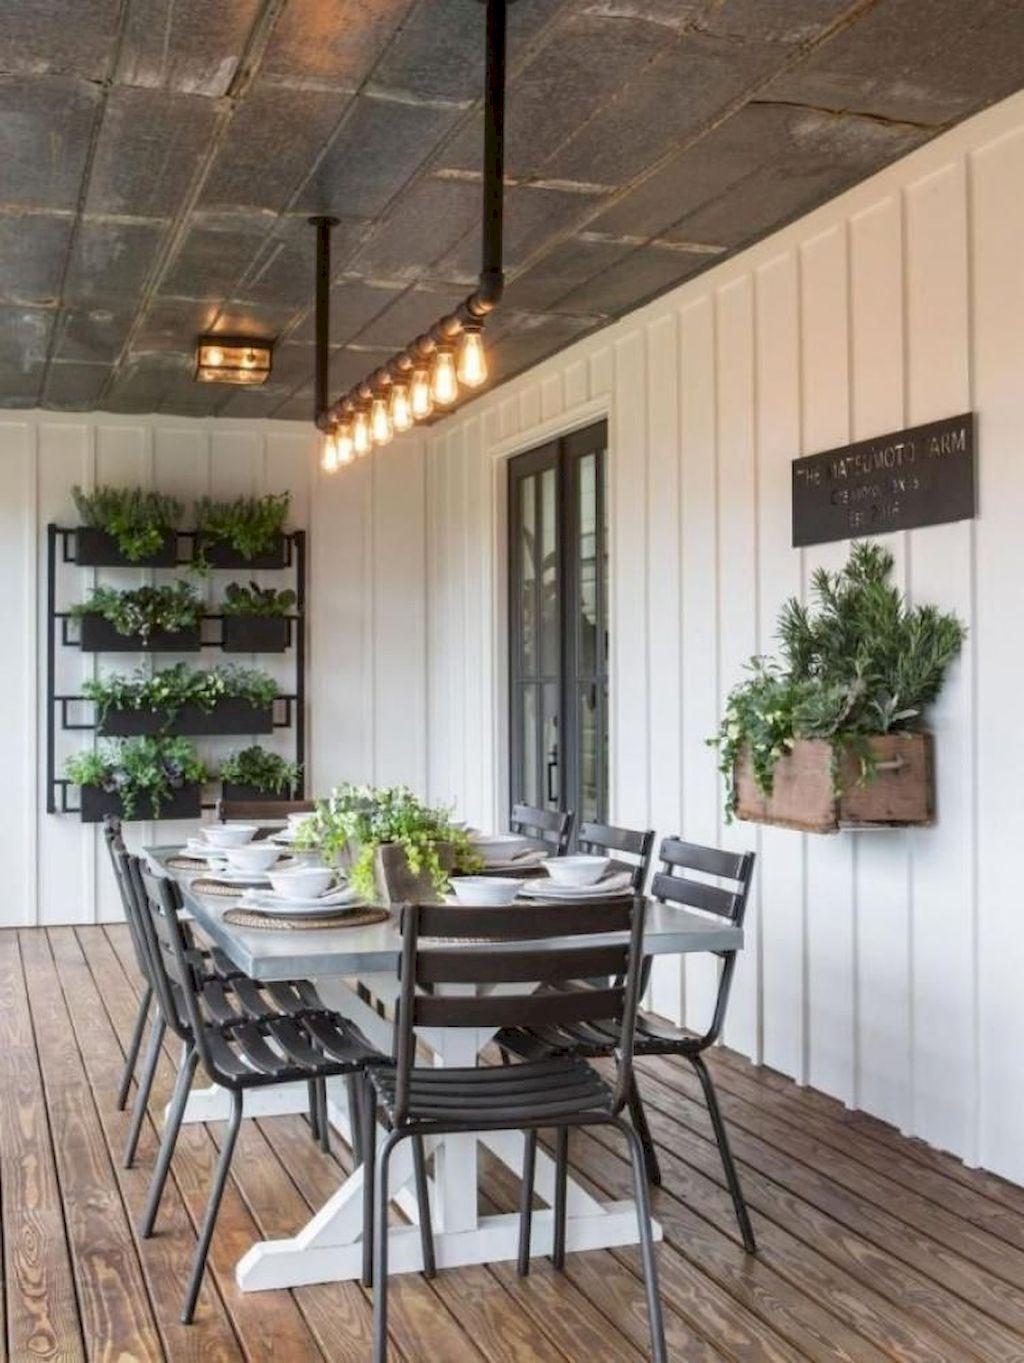 09 Rustic Farmhouse Exterior Design Ideas